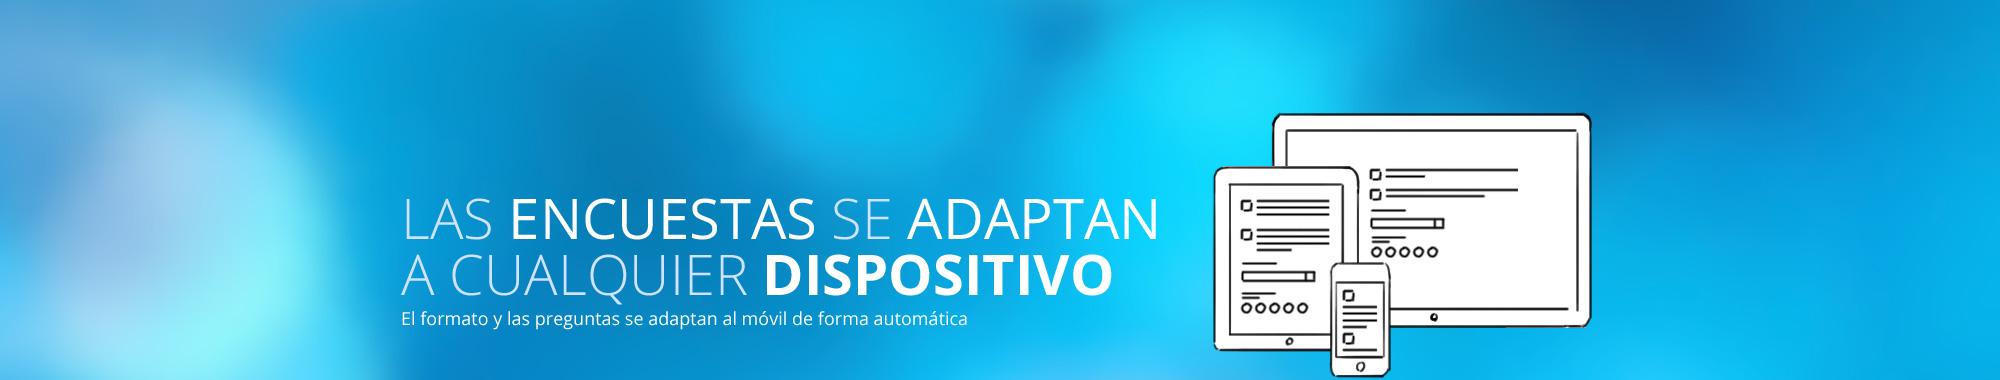 slider_adaptan